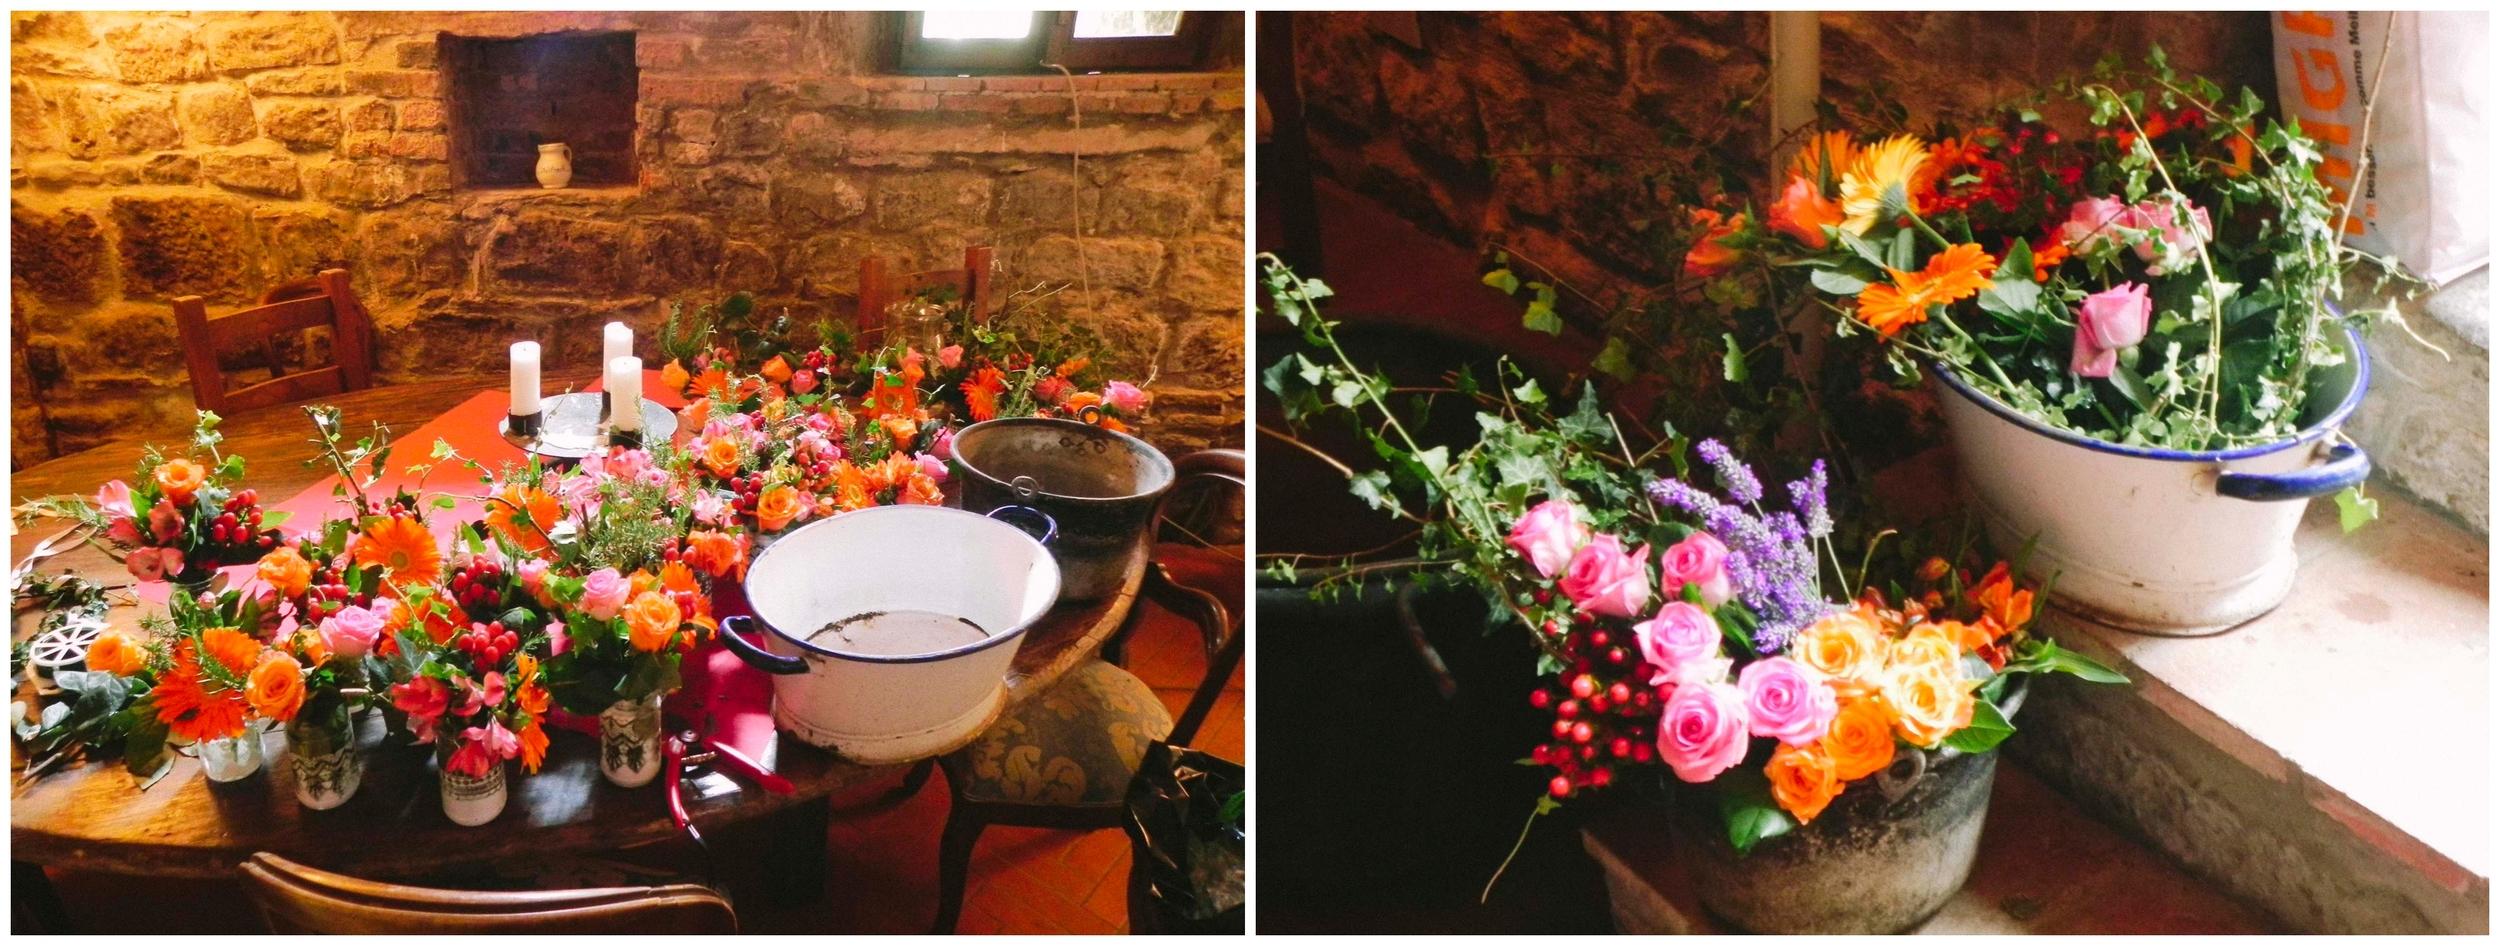 tuscany_wedding-04.jpg